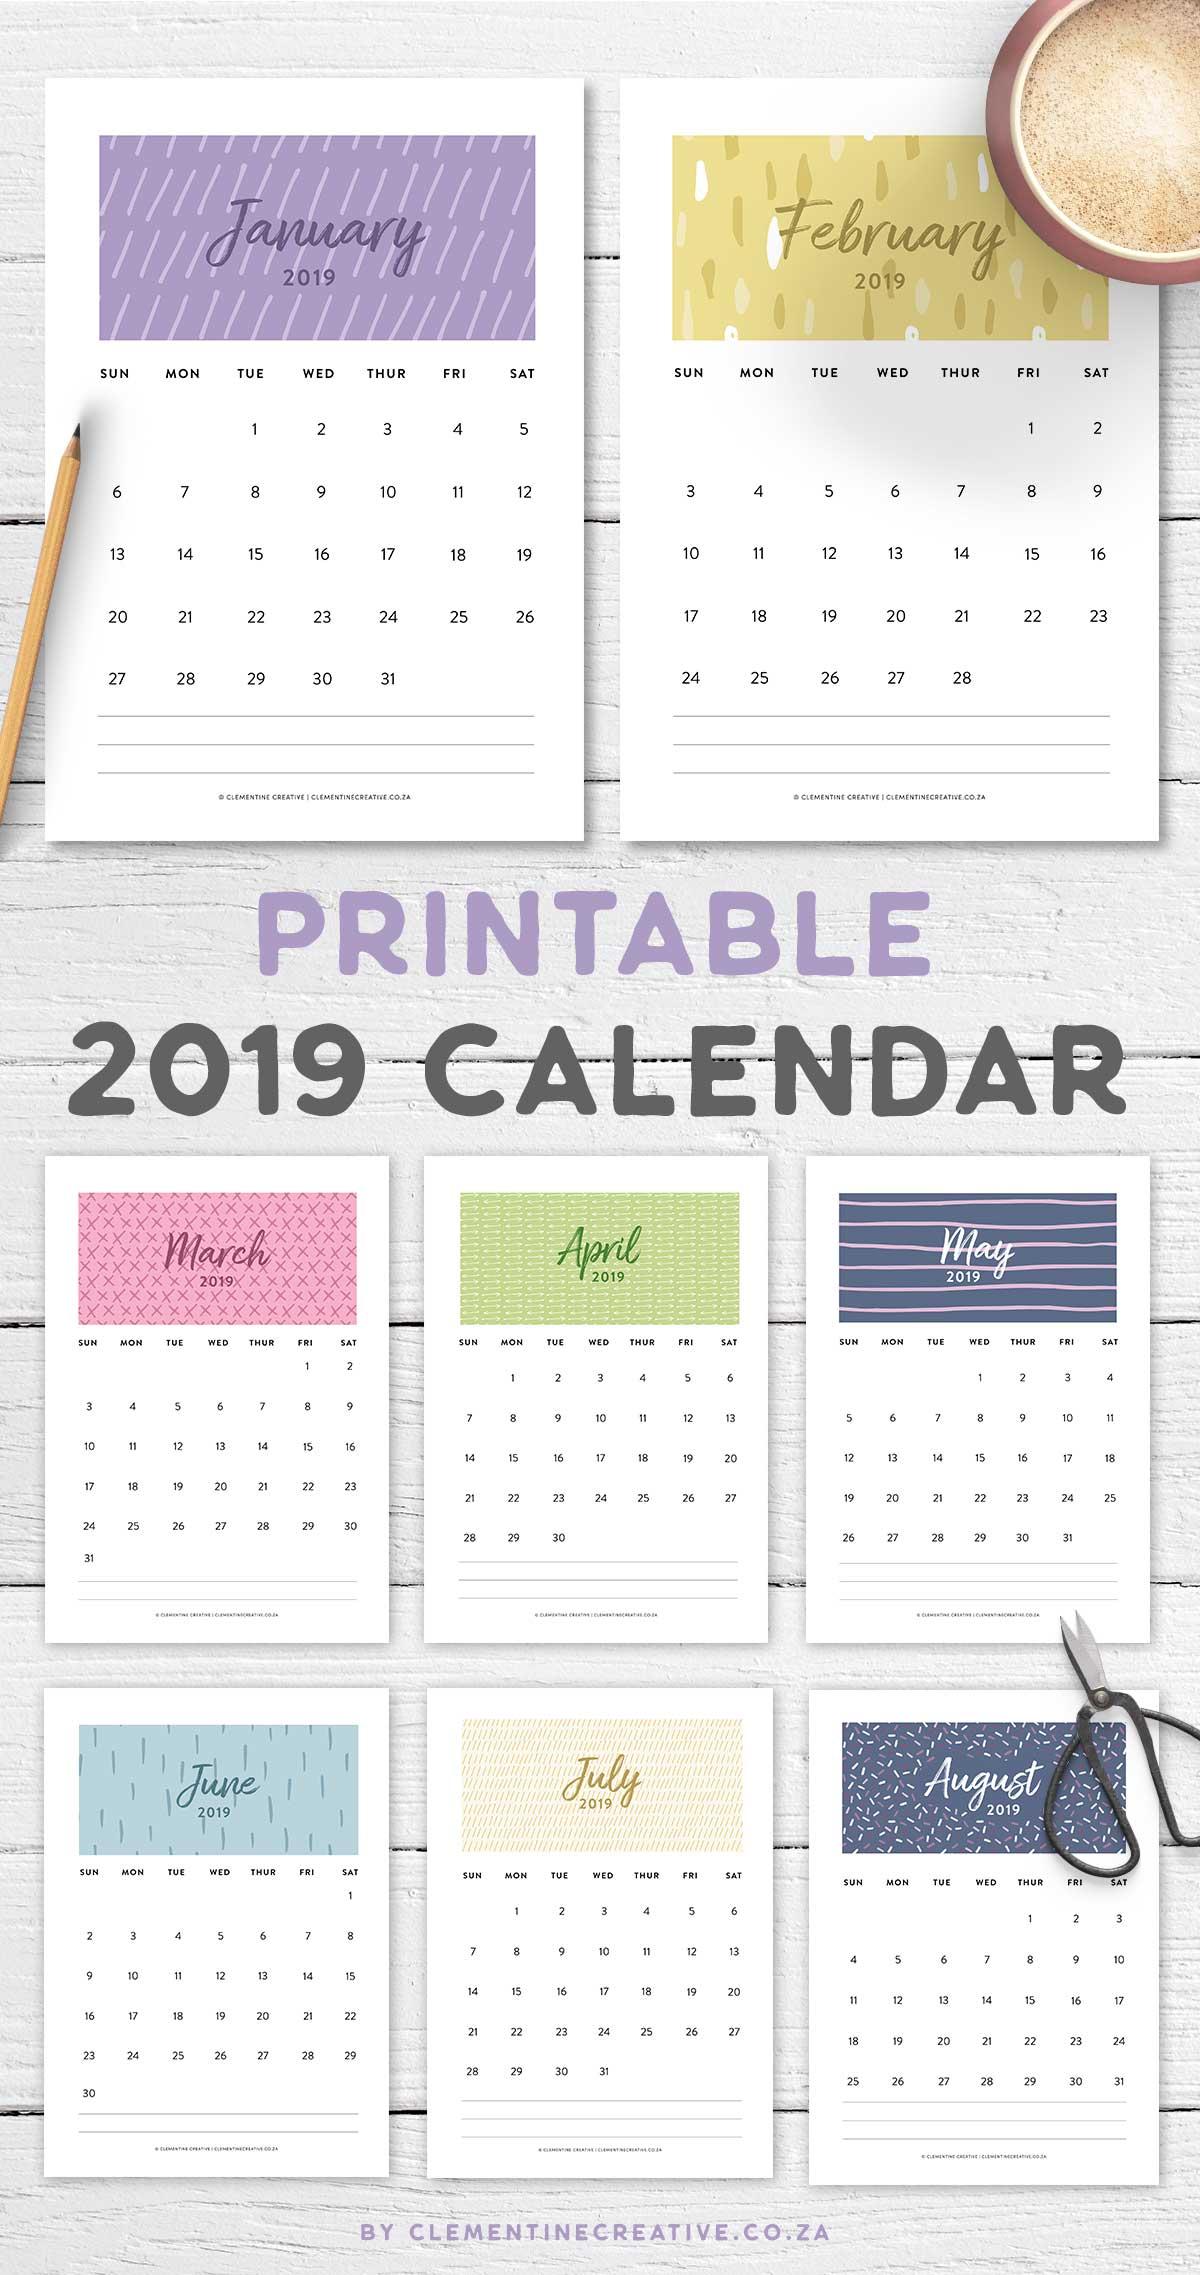 printable 2019 calendar